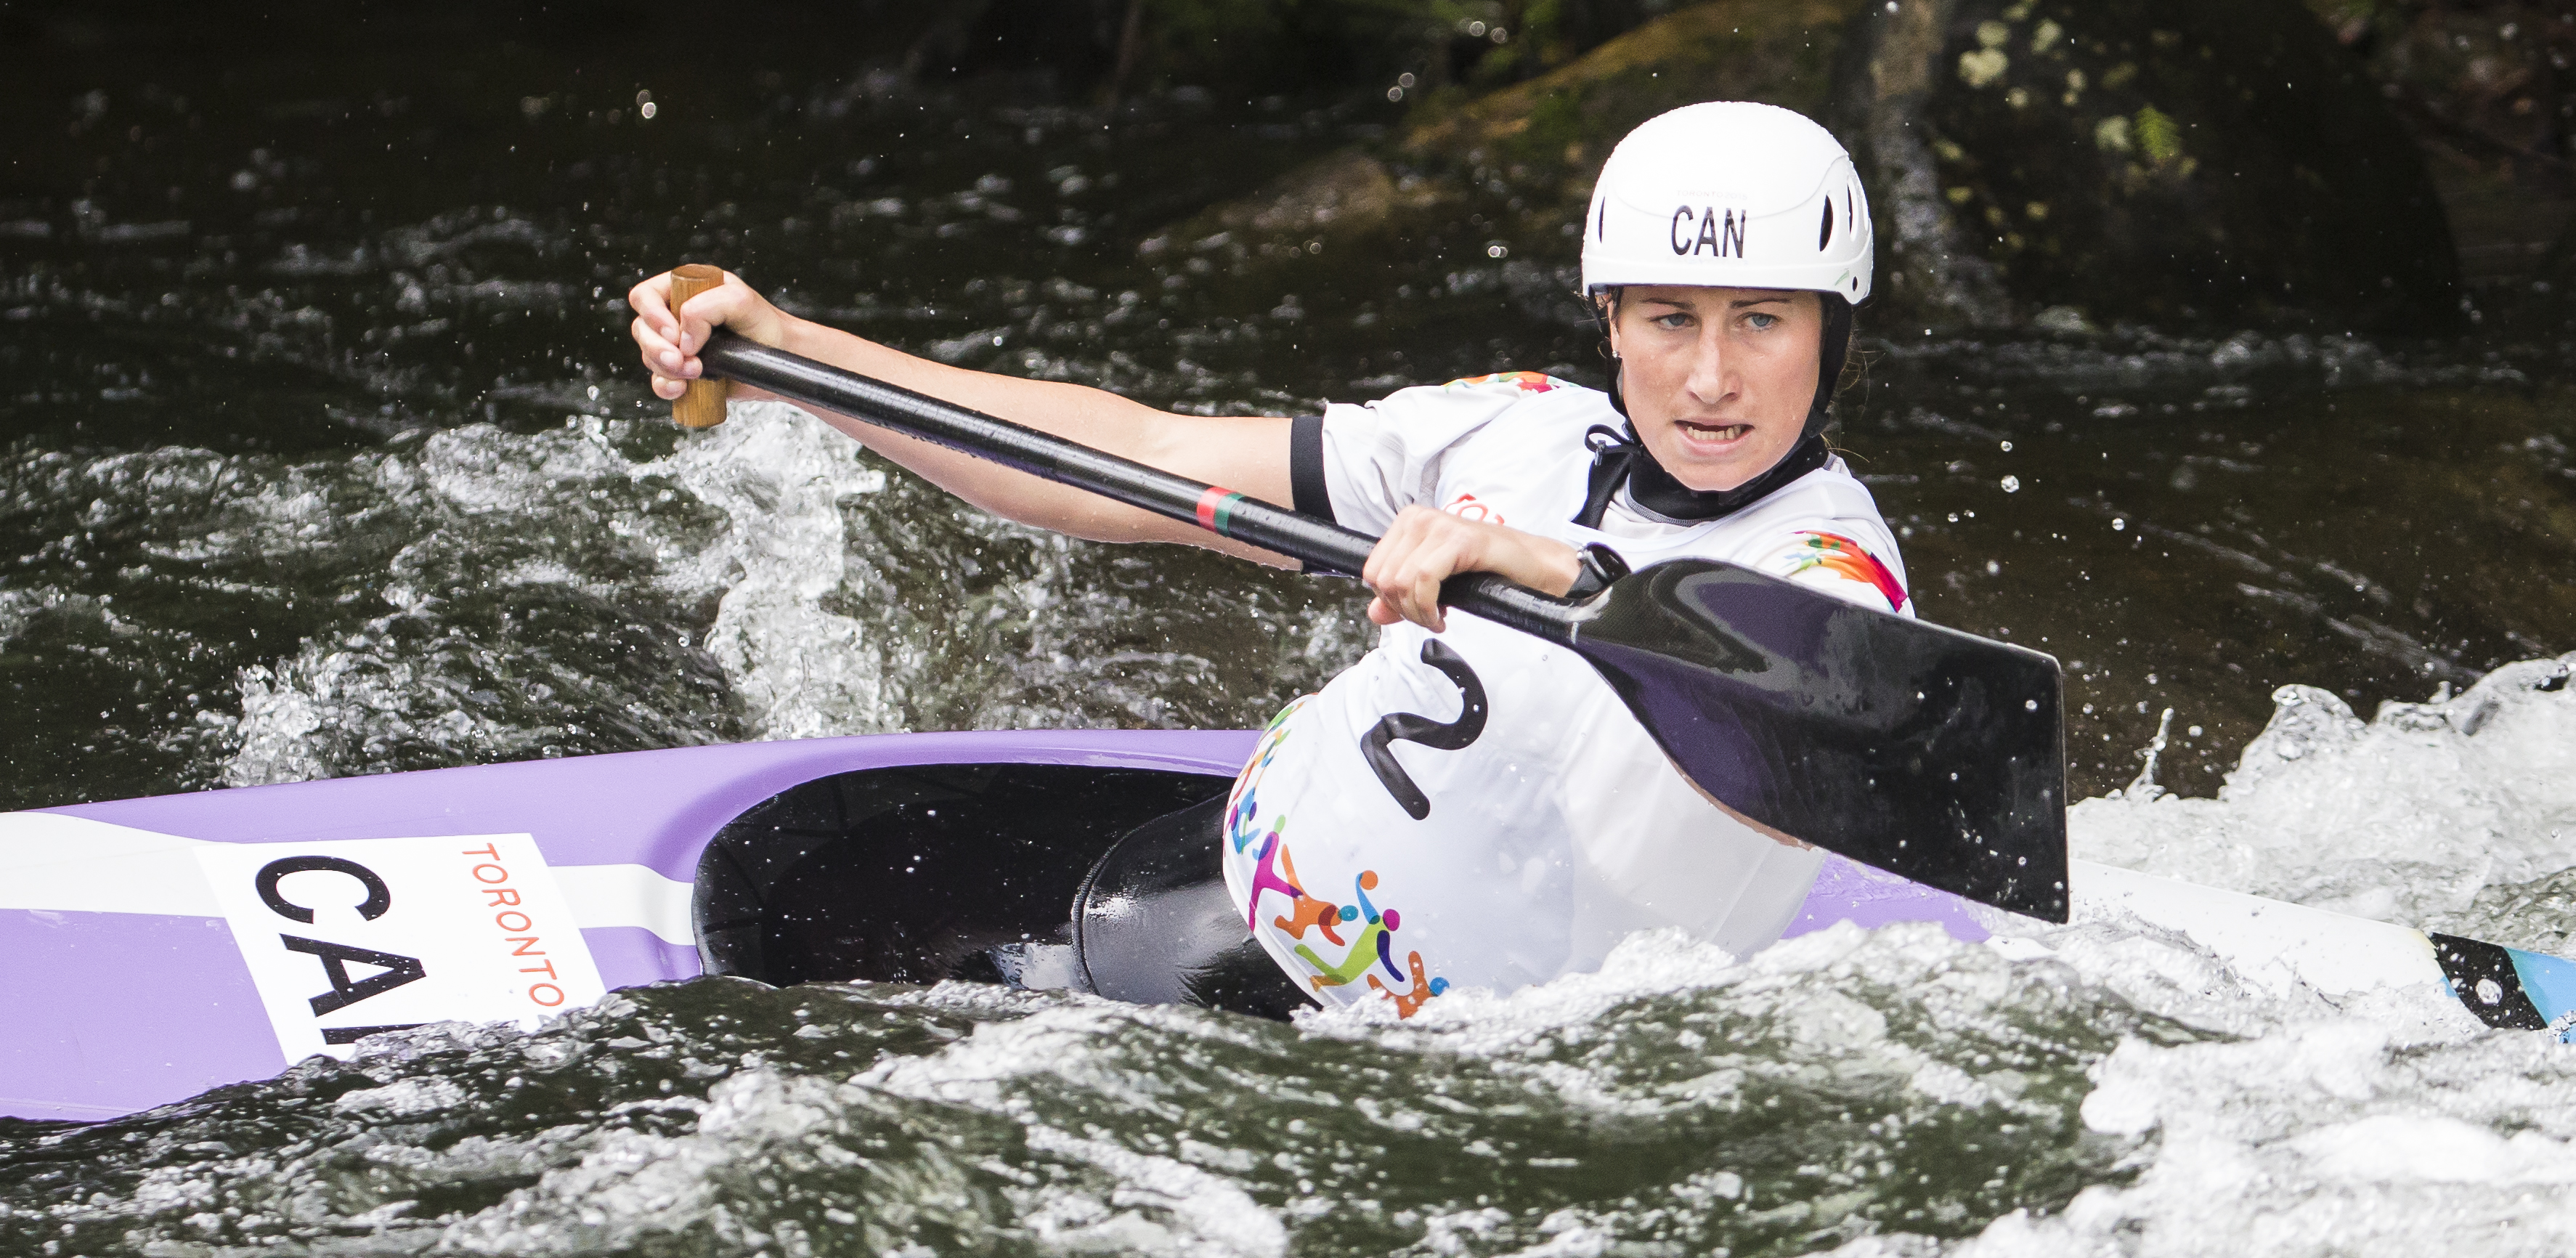 Haley Daniels paddles her slalom canoe through whitewater